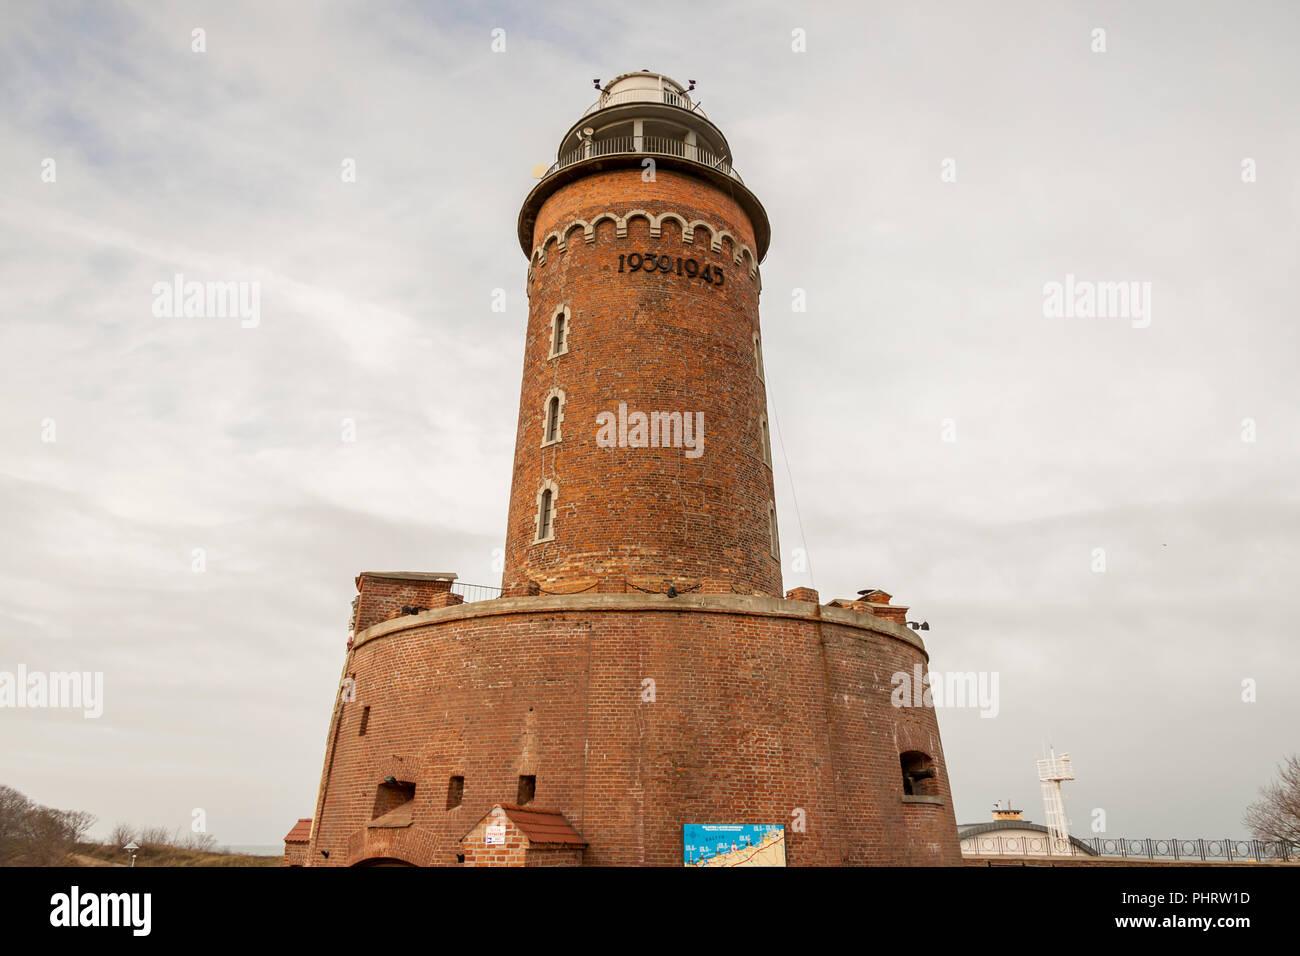 Lighthouse in Kolobrzeg, Poland. - Stock Image